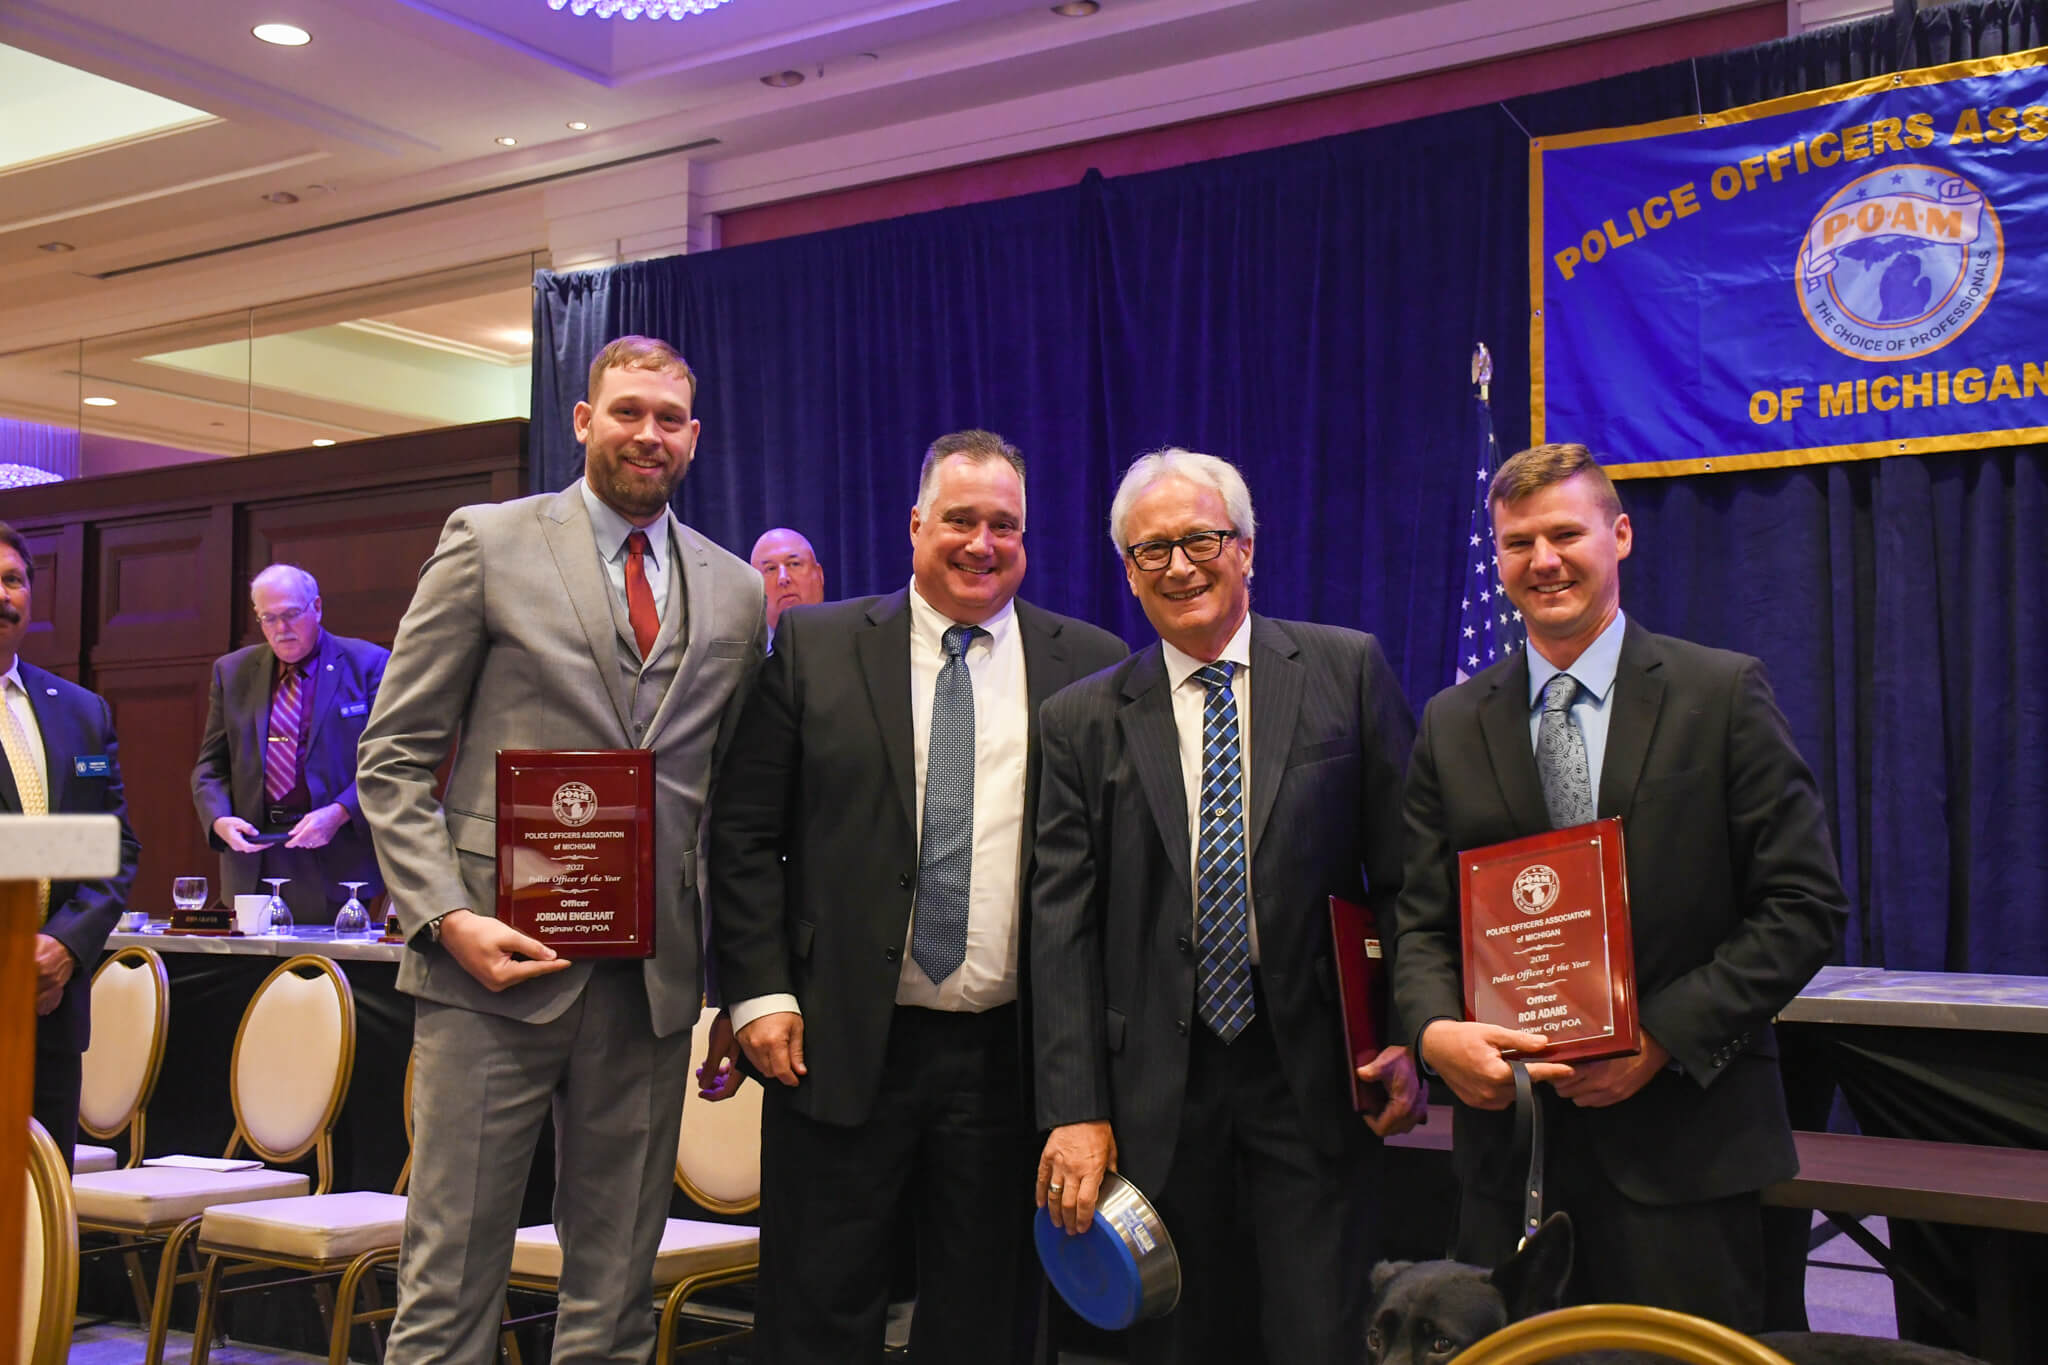 Saginaw City Officers Jordan Engelhart, Rob Adams, and K9 Deebo